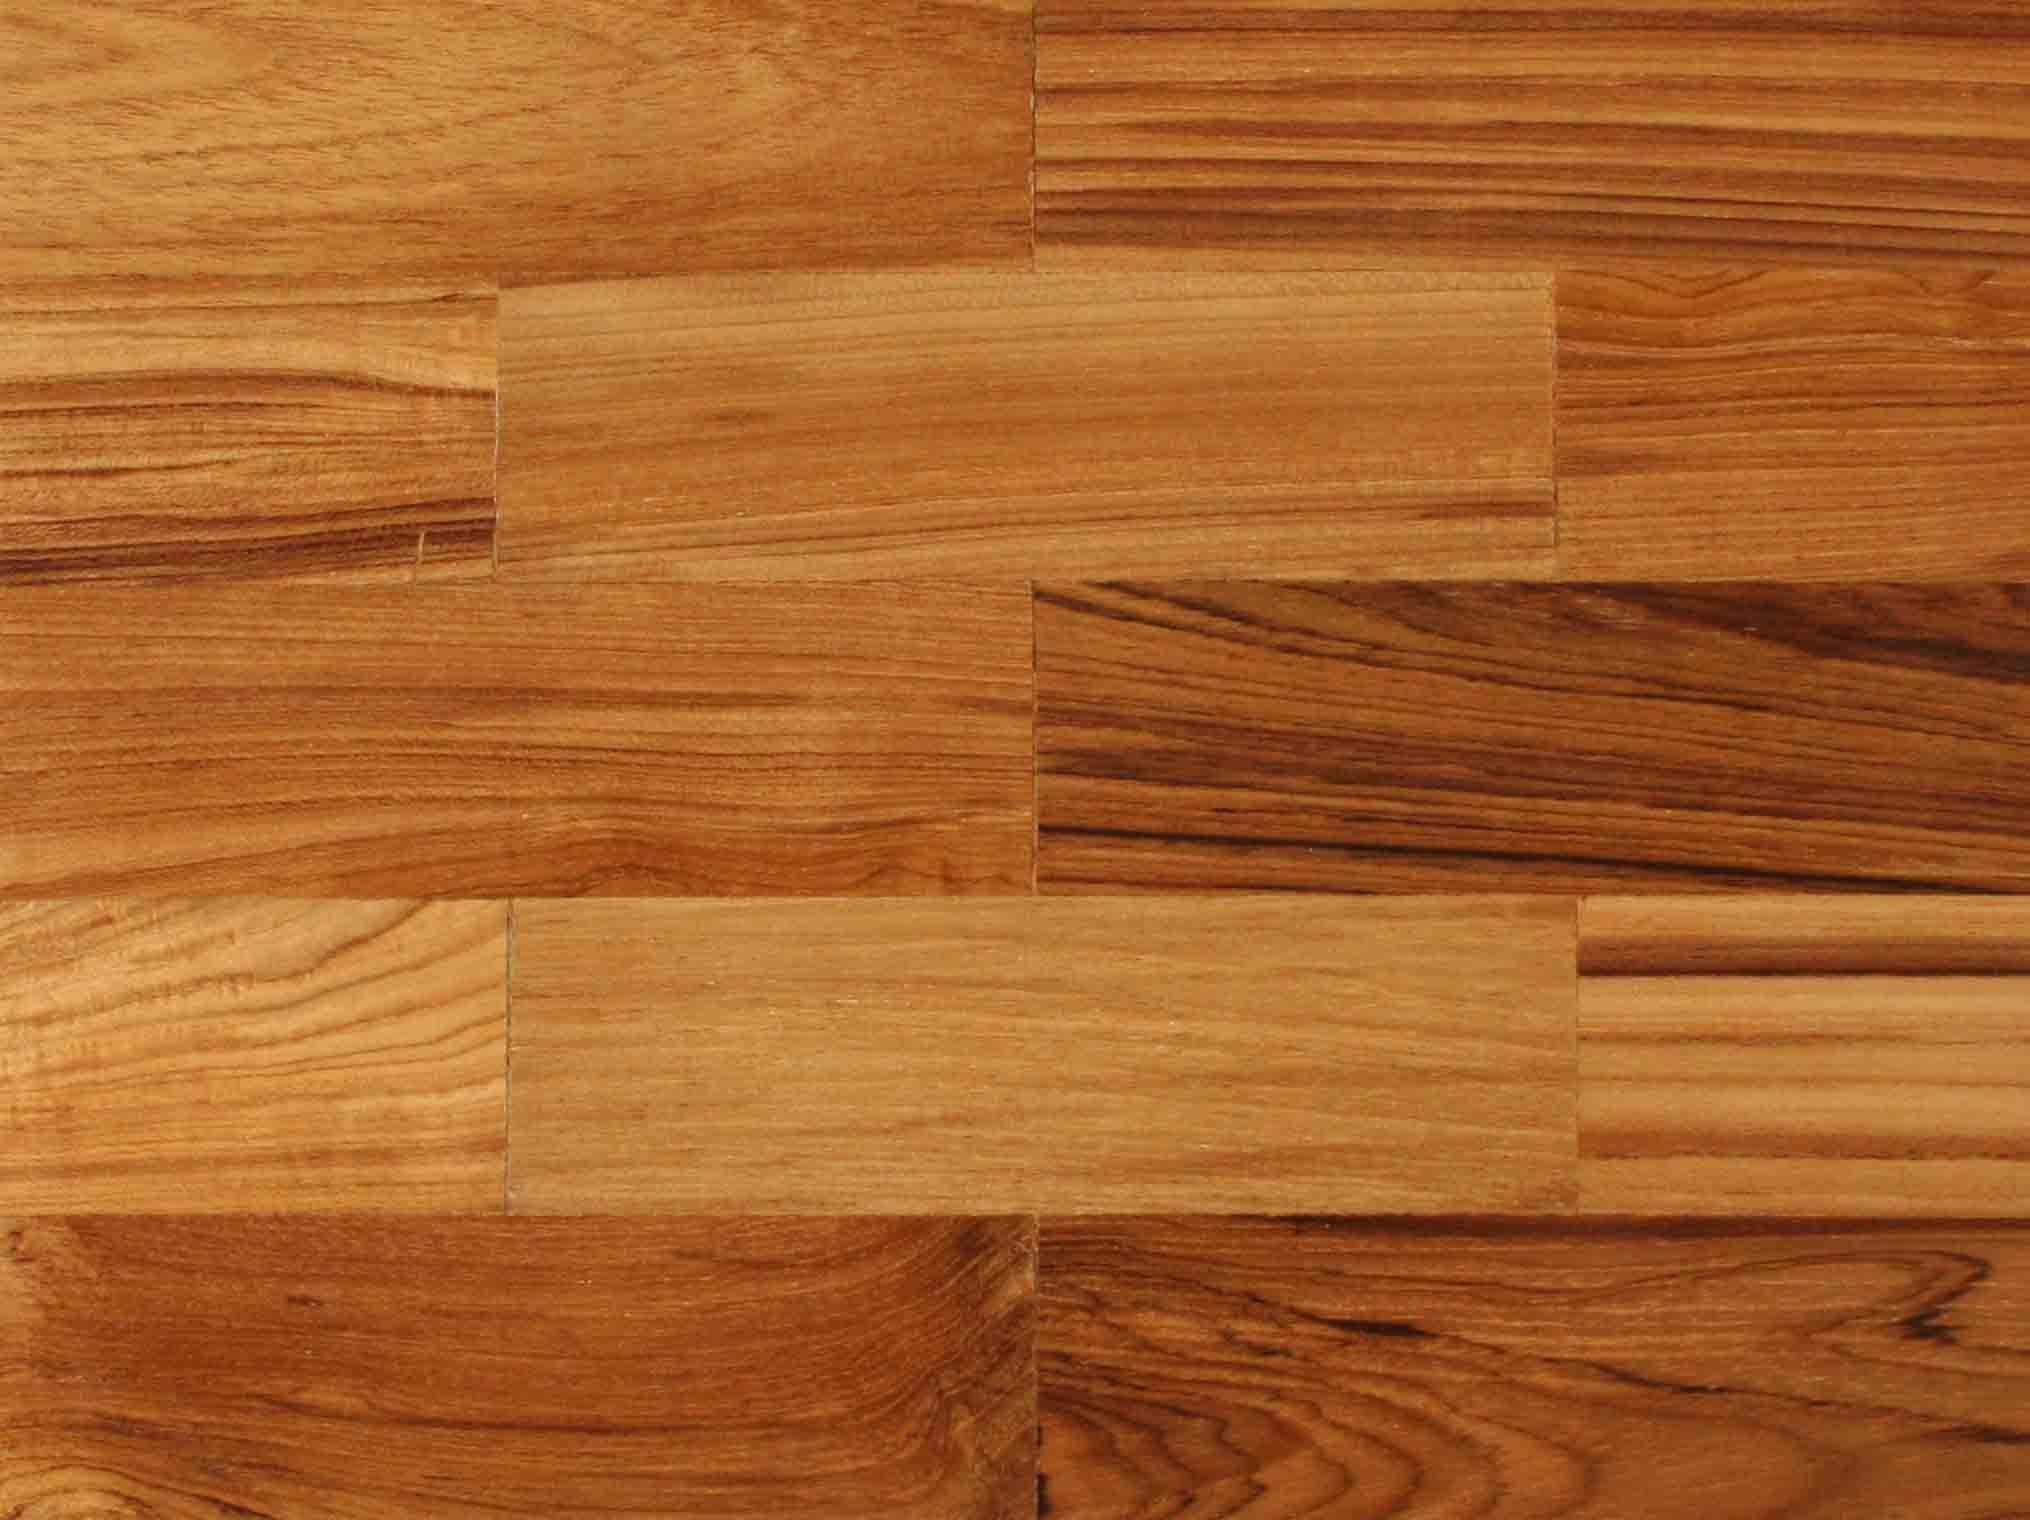 red cera free pin bella flooring walnut rosso floors underlayment noce with laminate